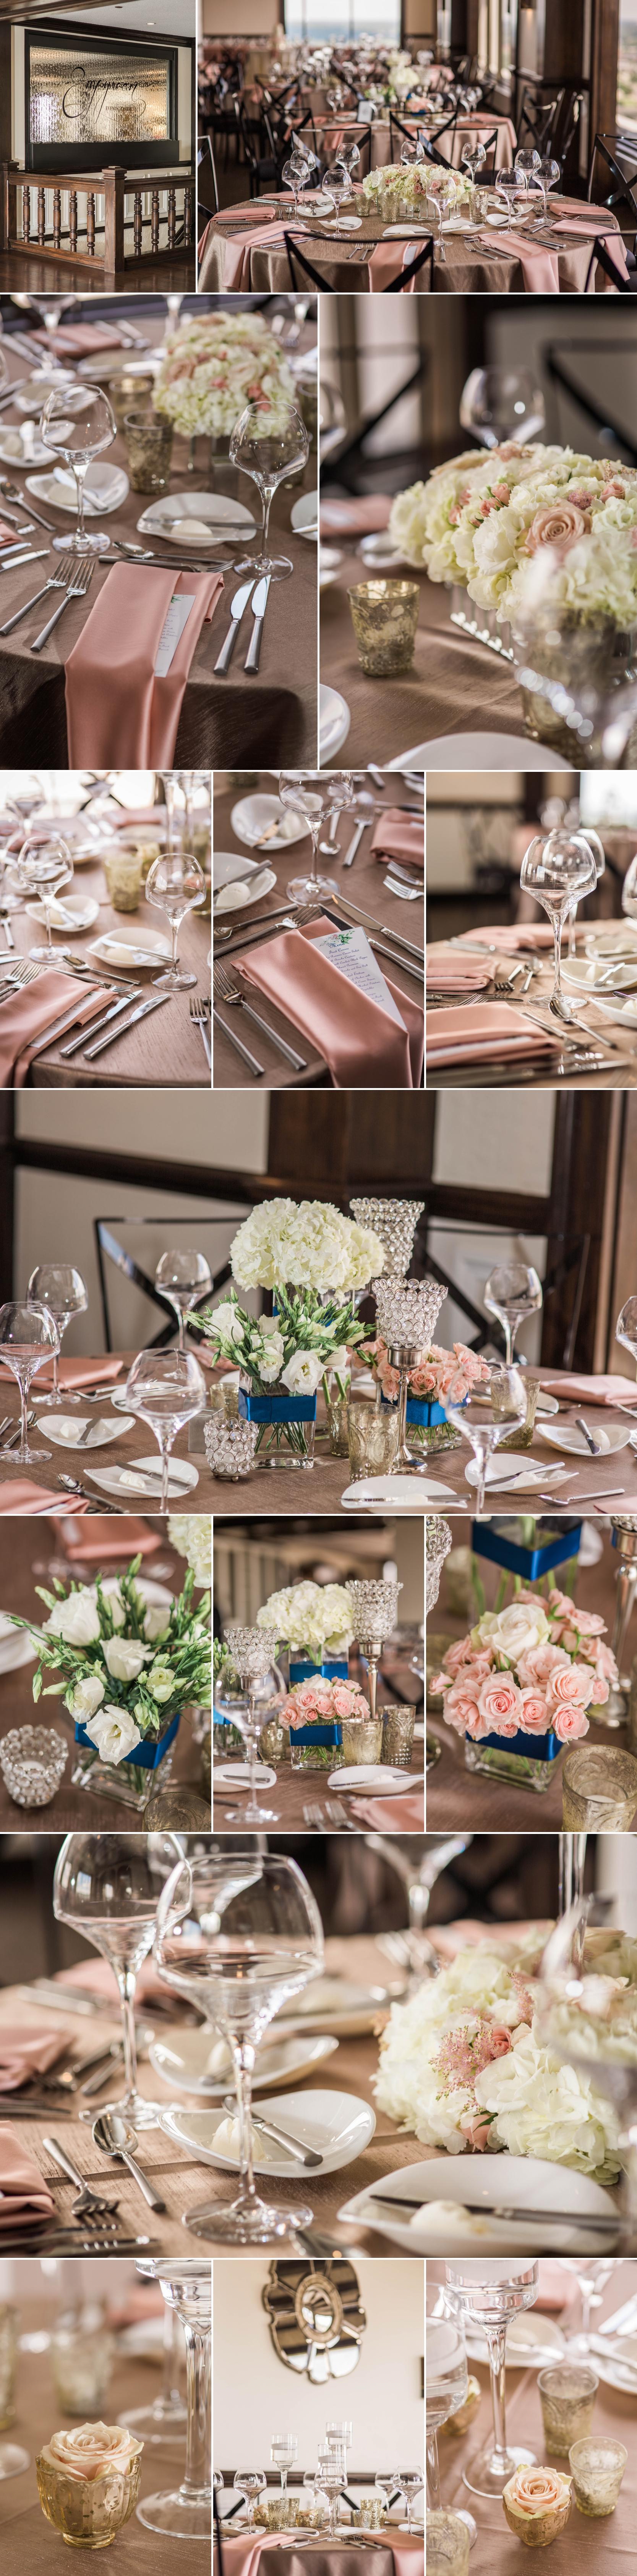 wedding-wedding day-downtown fort wayne-bride-groom-love-wedding party-reception-empyrean-details